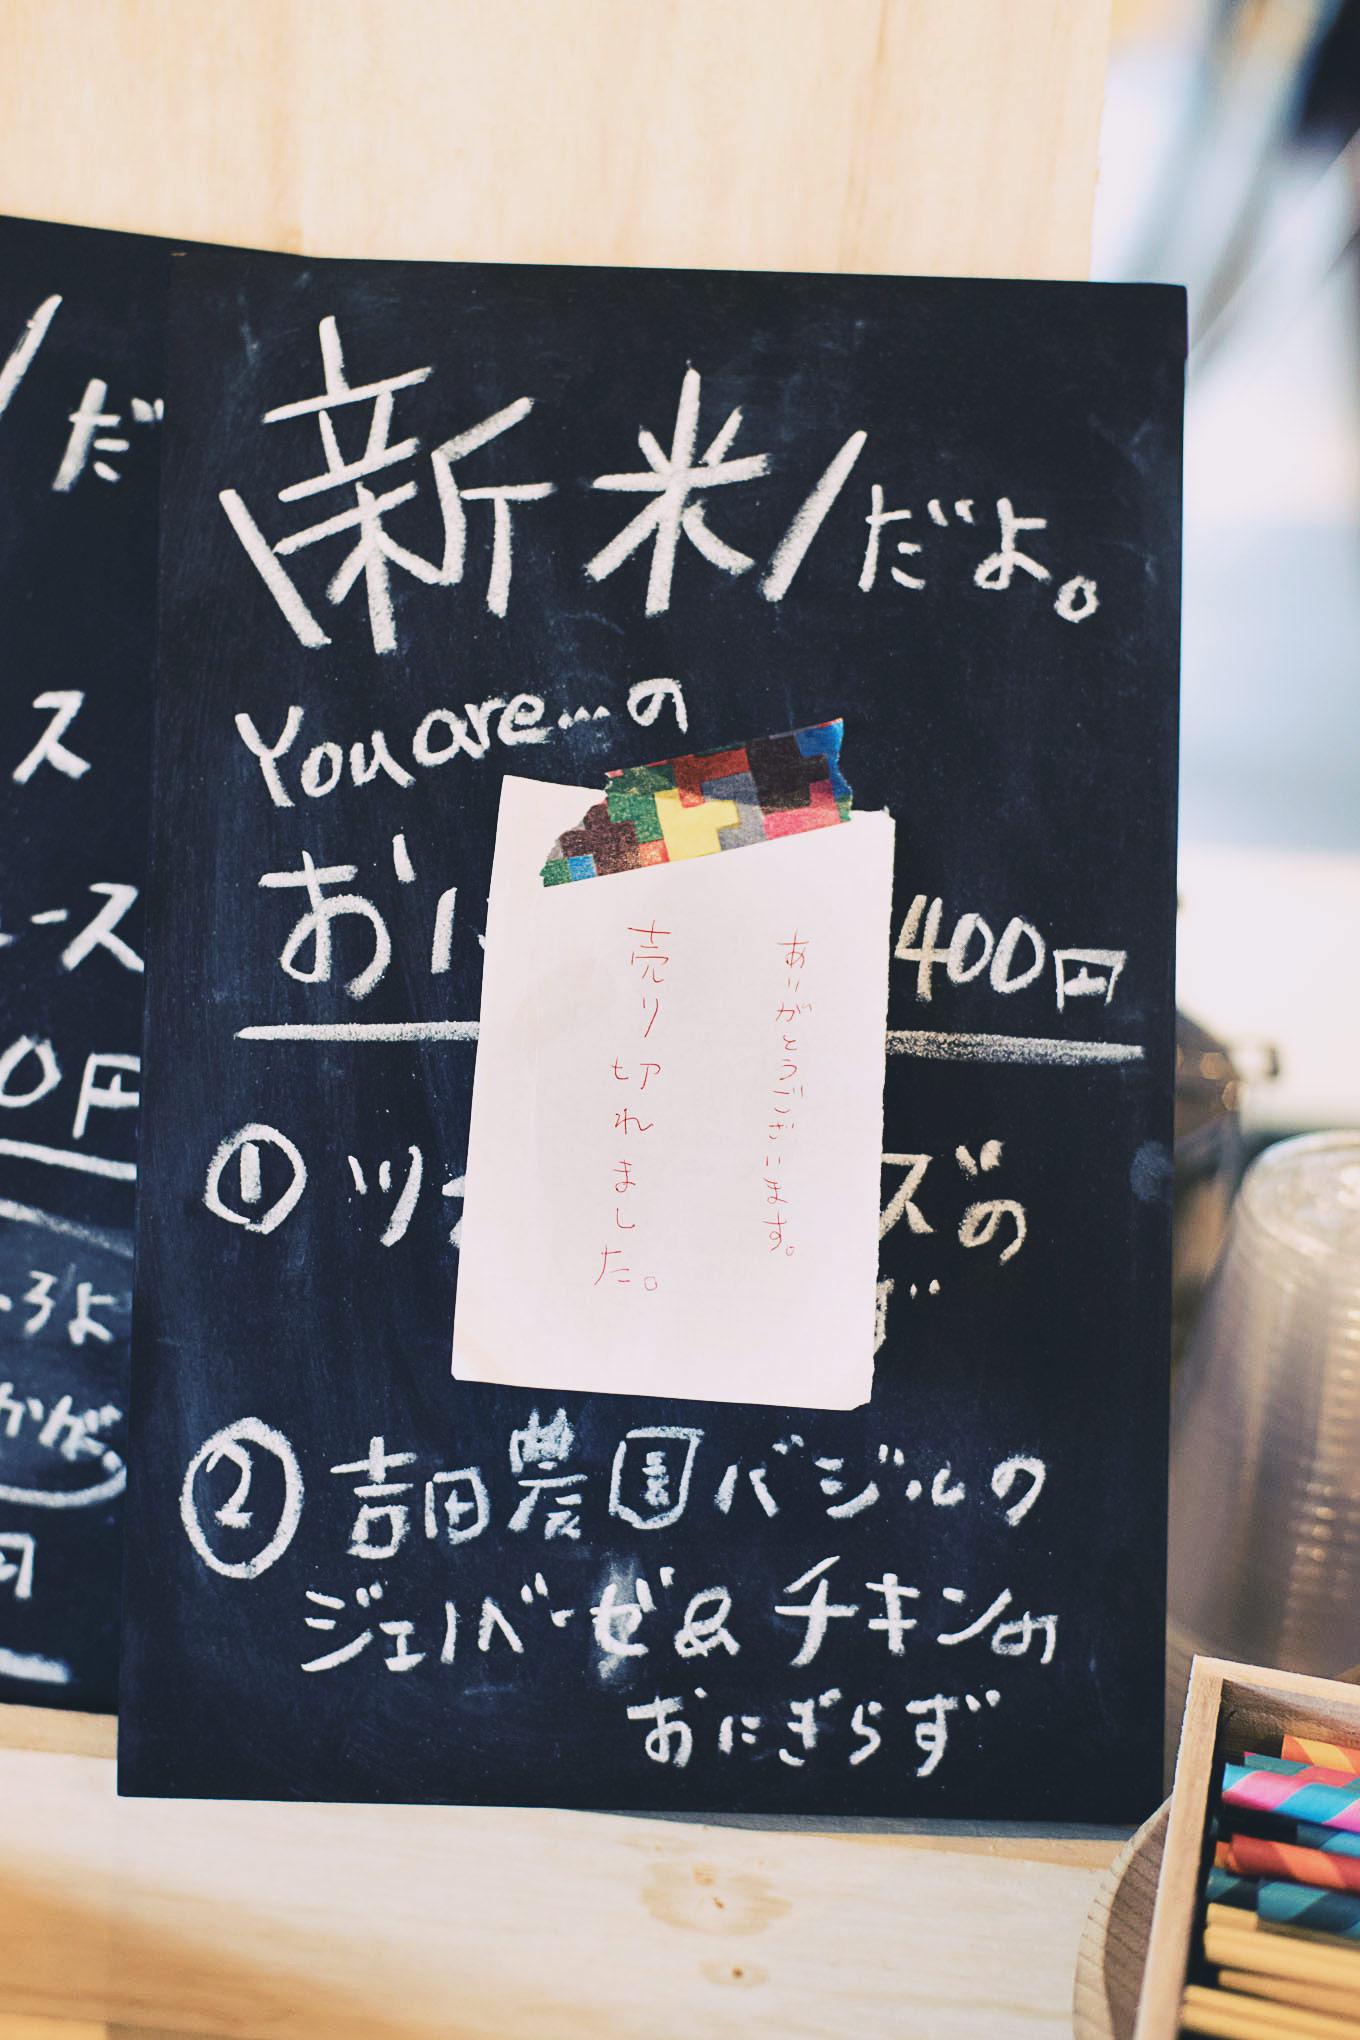 nagaya-ennichi-20151010-2